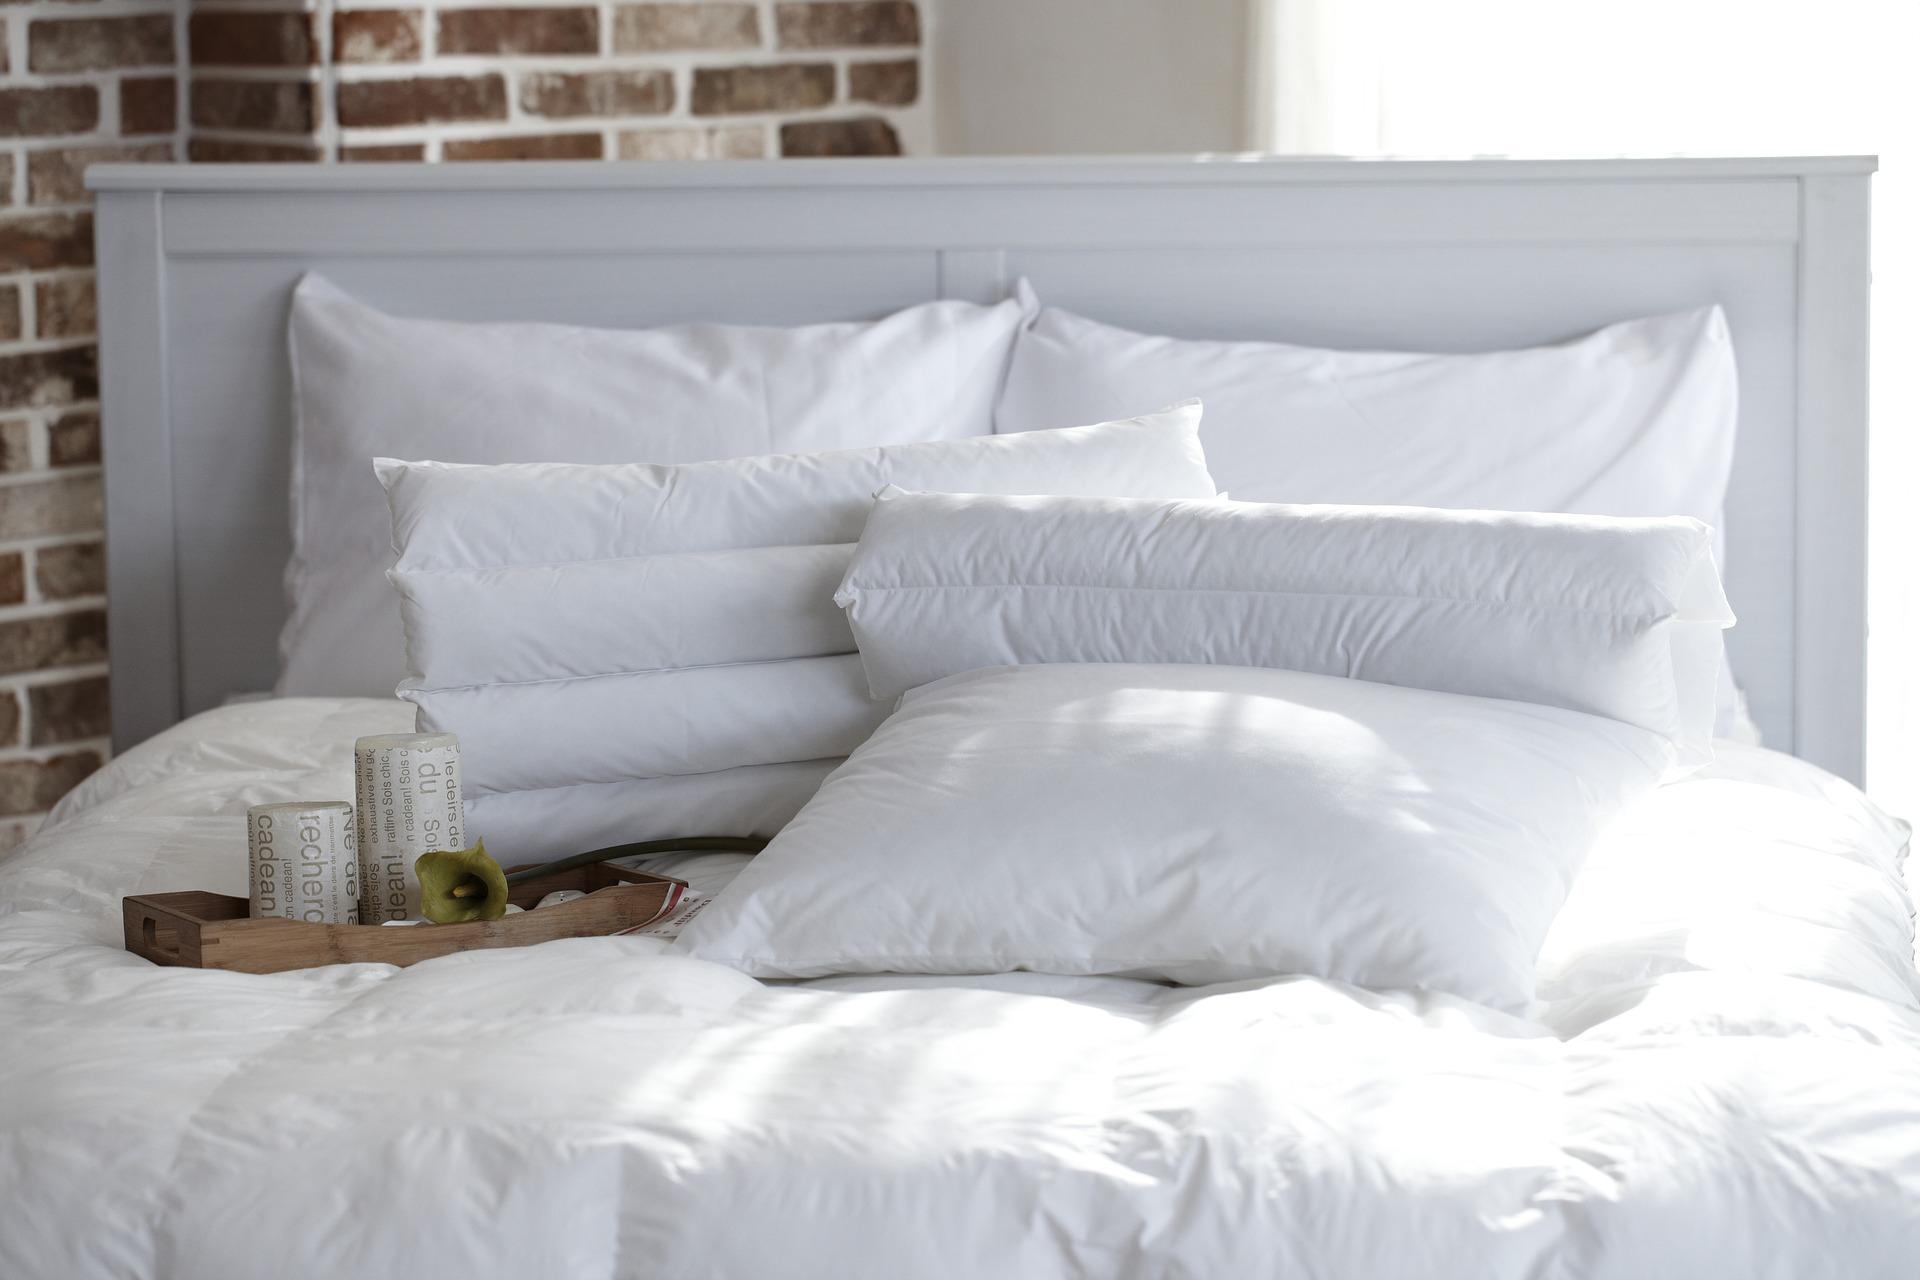 limpieza de almohadas - blog pressto españa